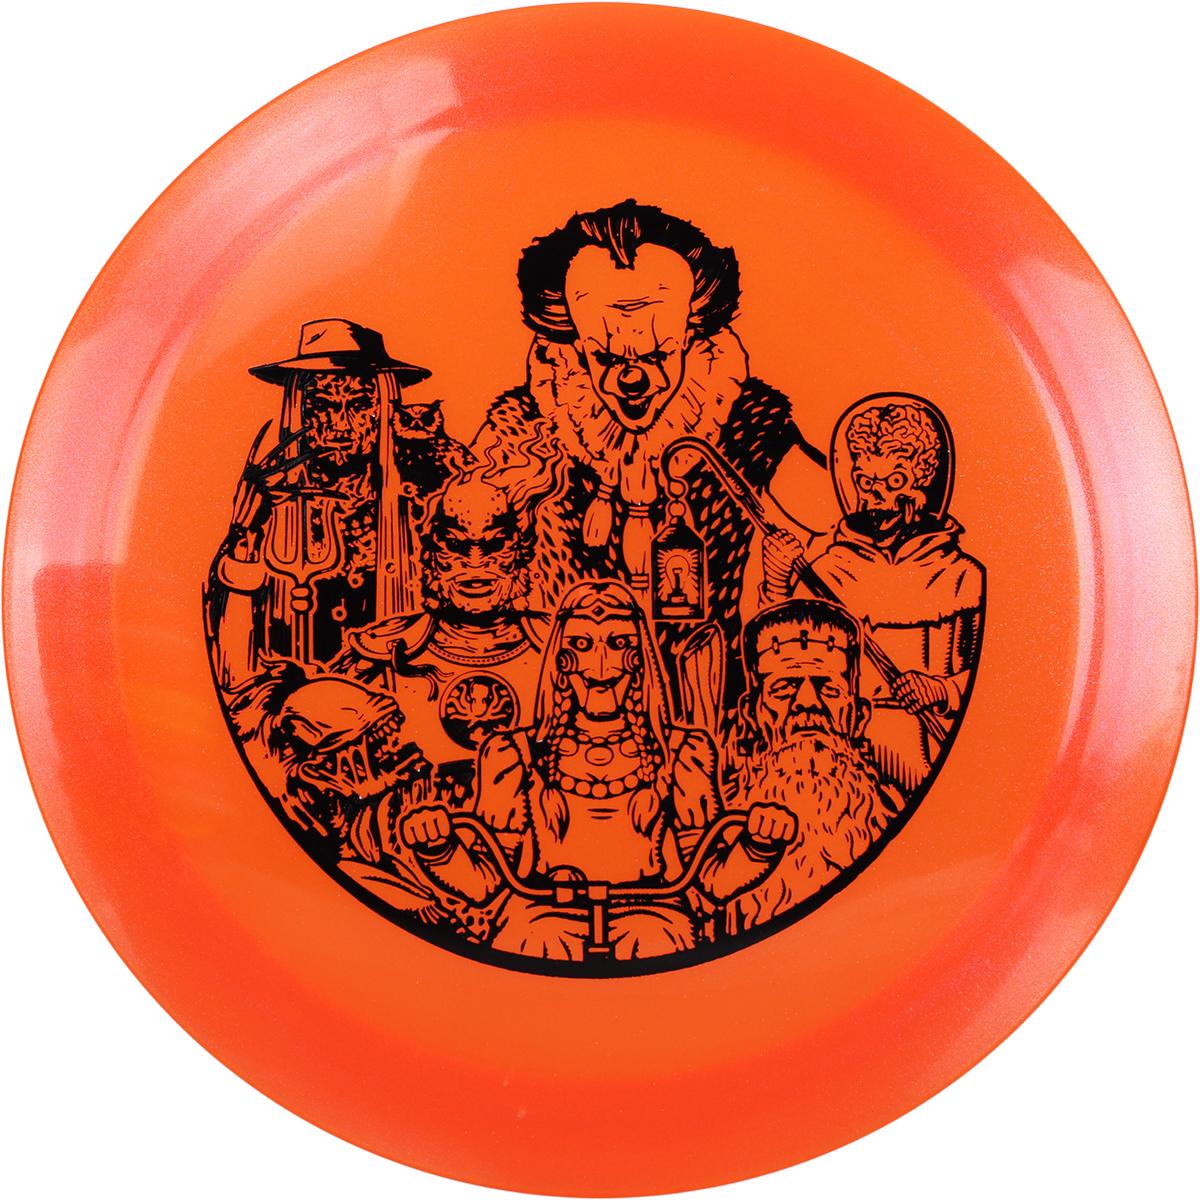 Westside Discs Vip Glimmer Boatman -Halloween-